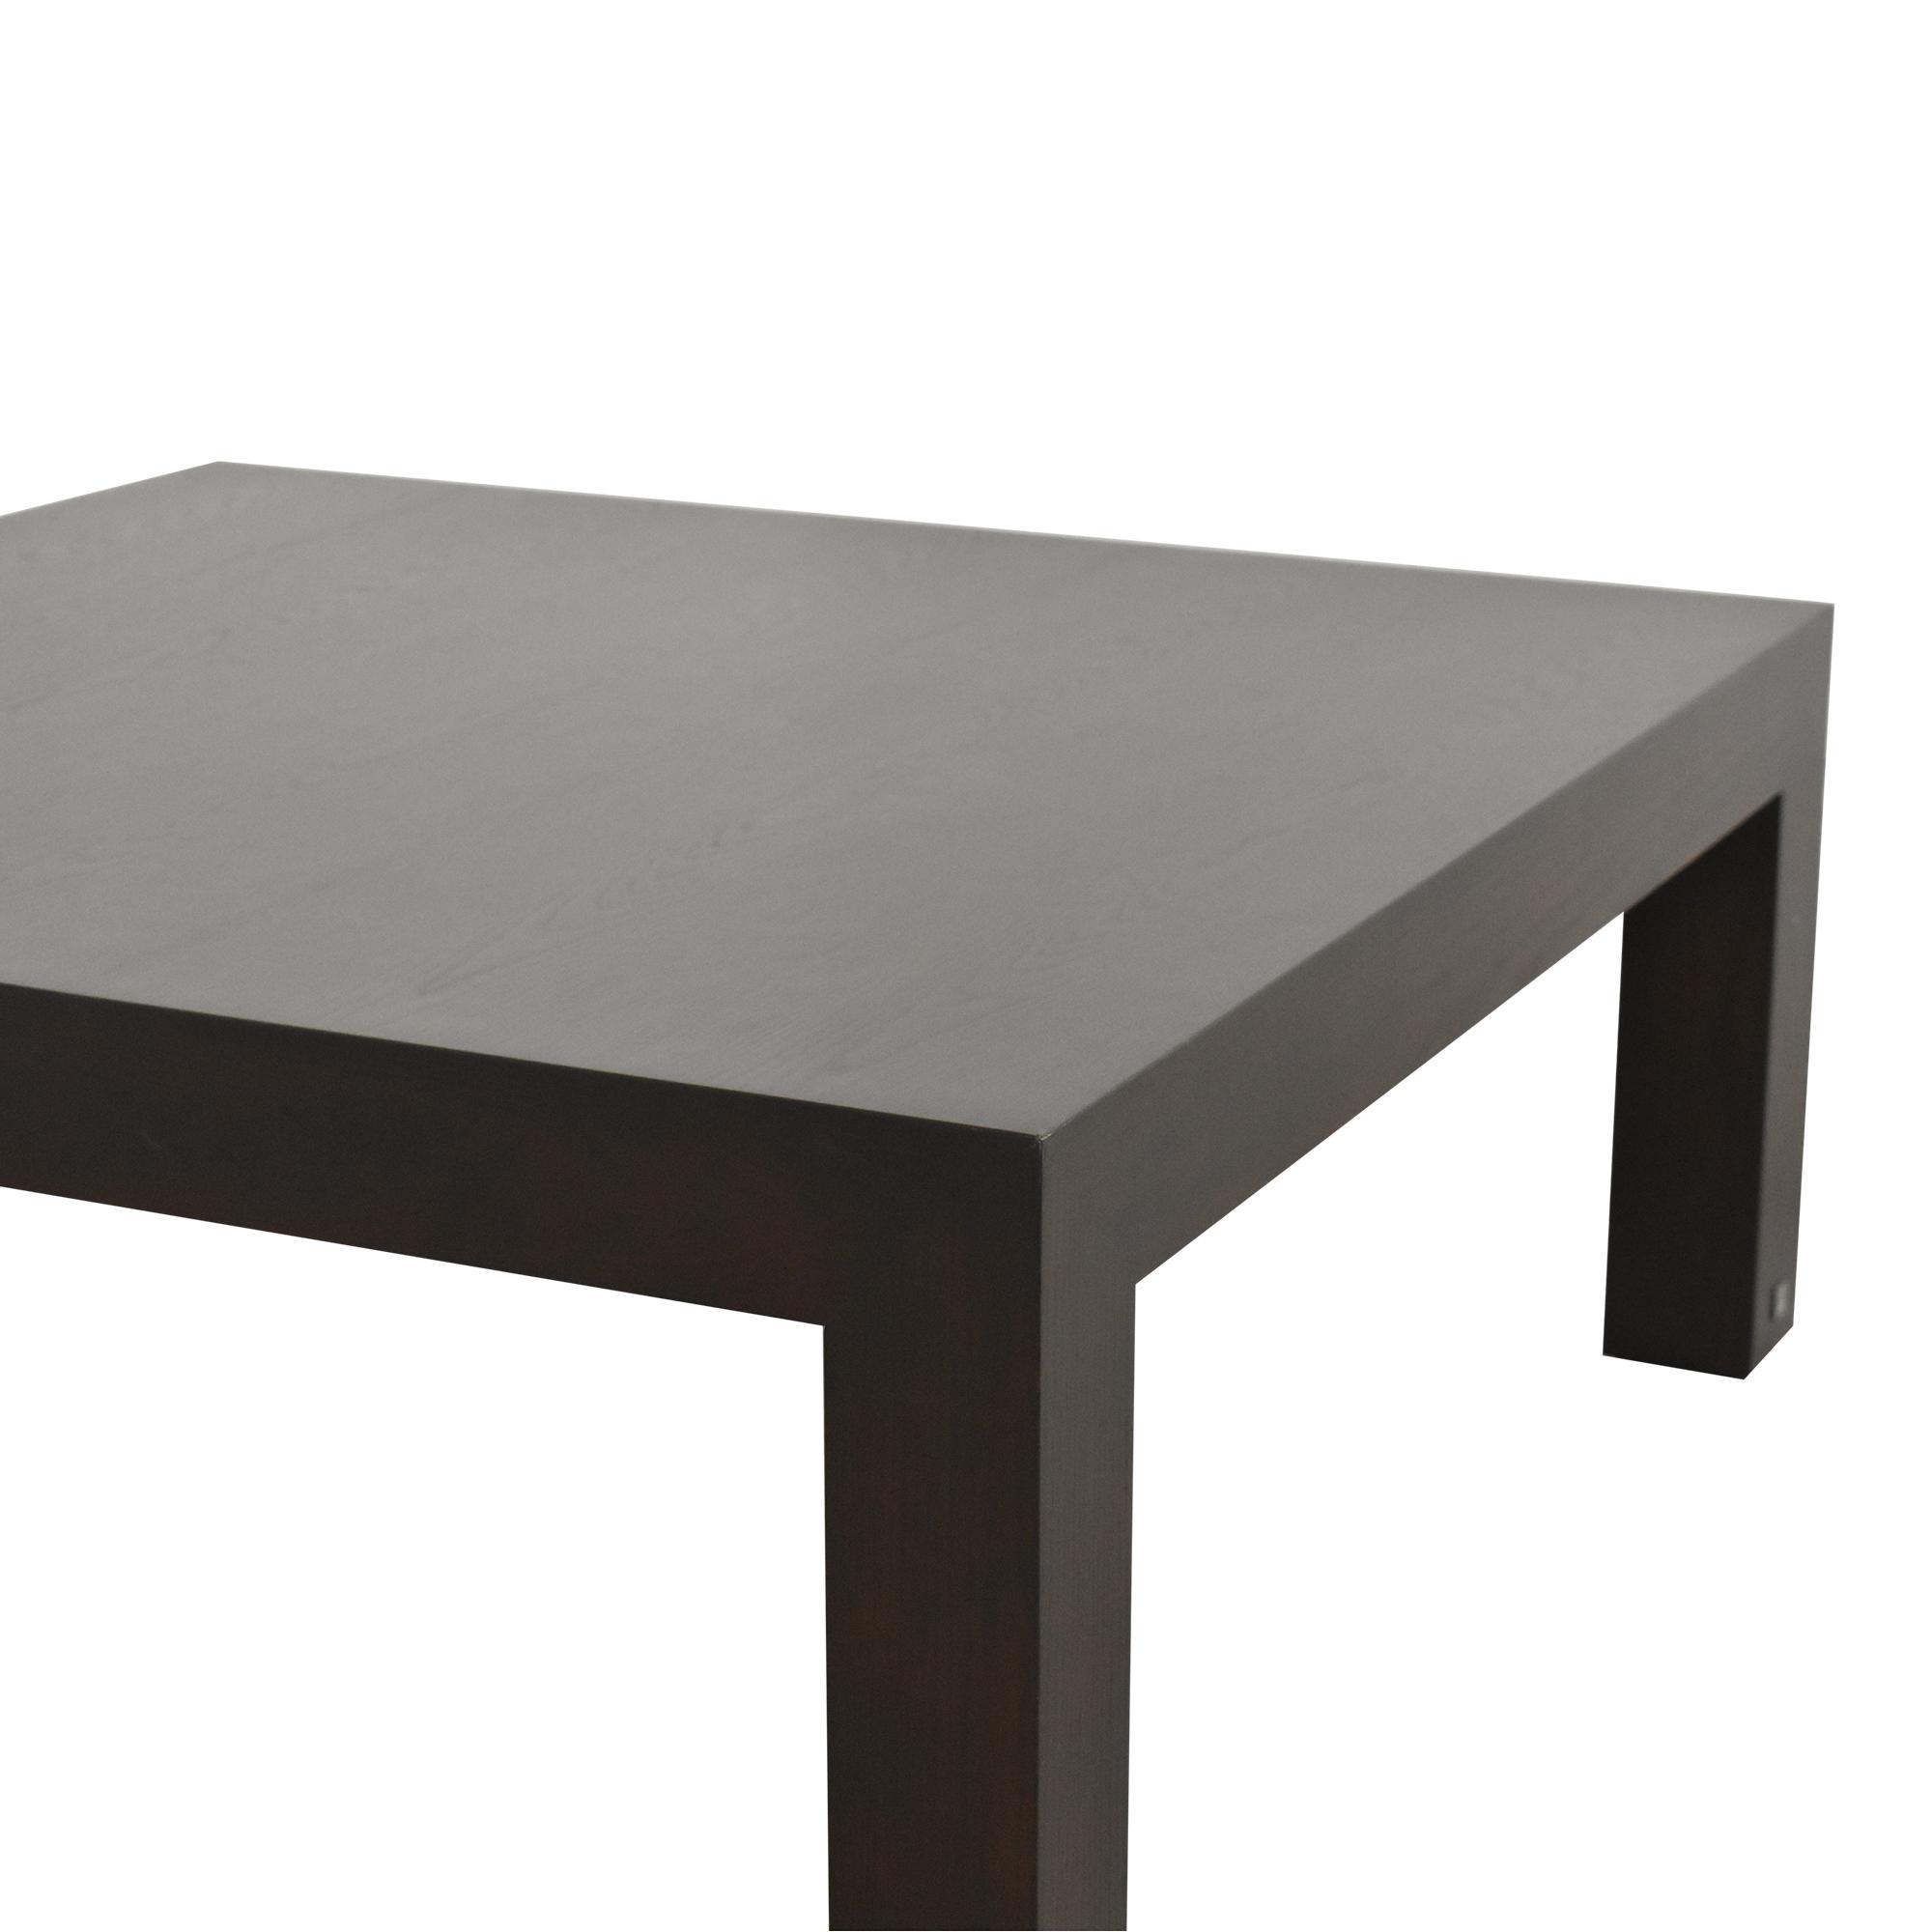 Desiron Rio Square Cocktail Table / Coffee Tables